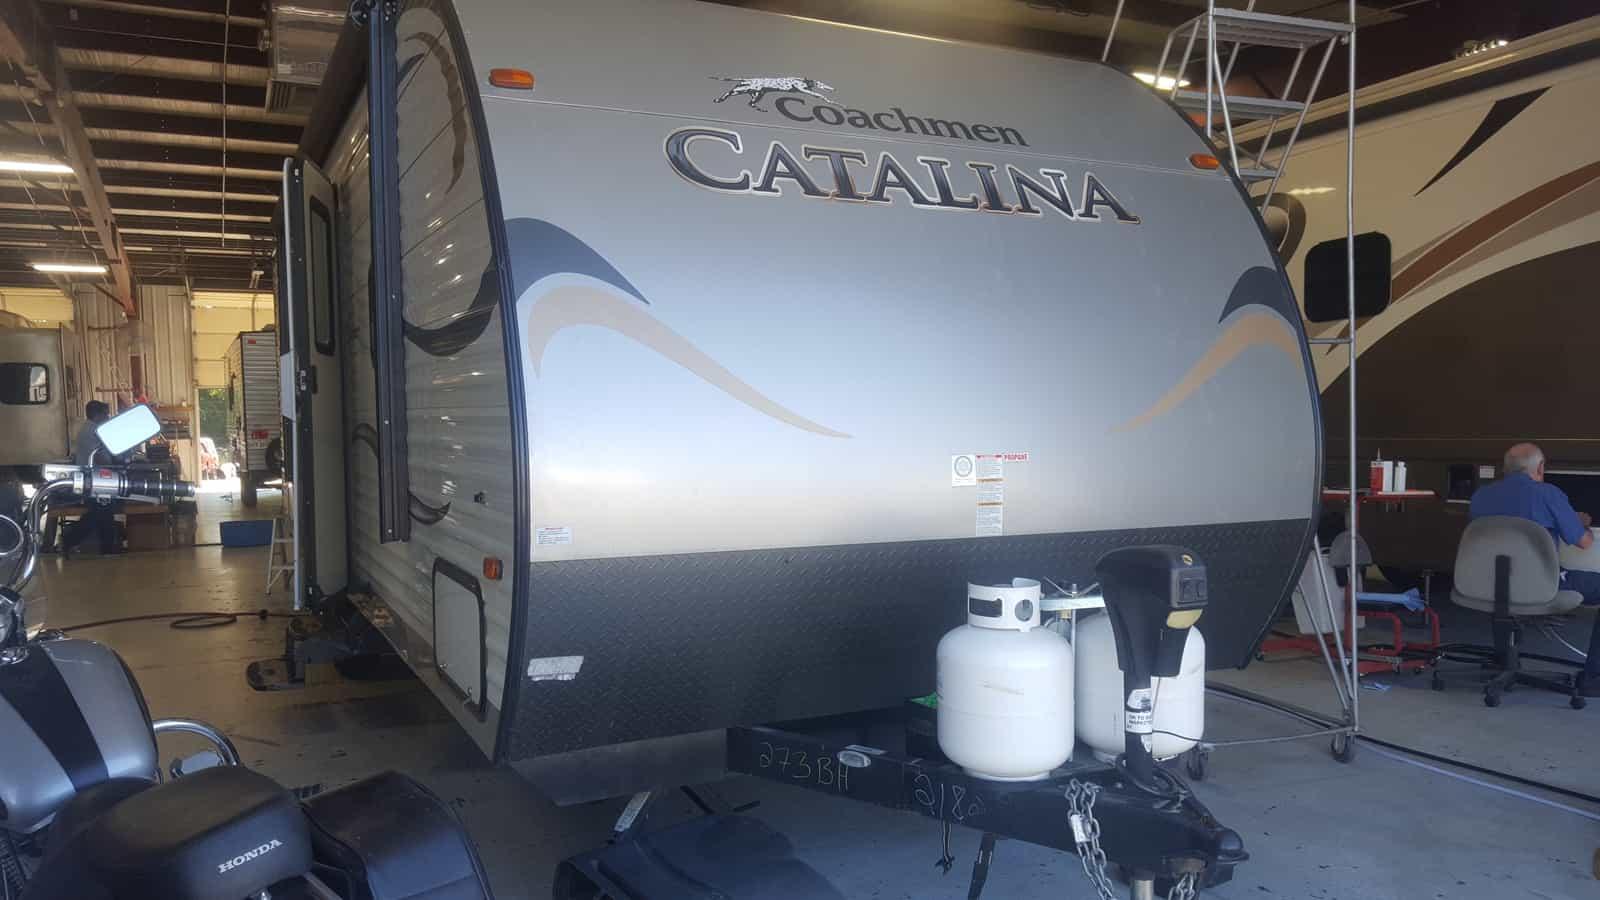 USED 2016 Coachmen CATALINA 273BH - American RV